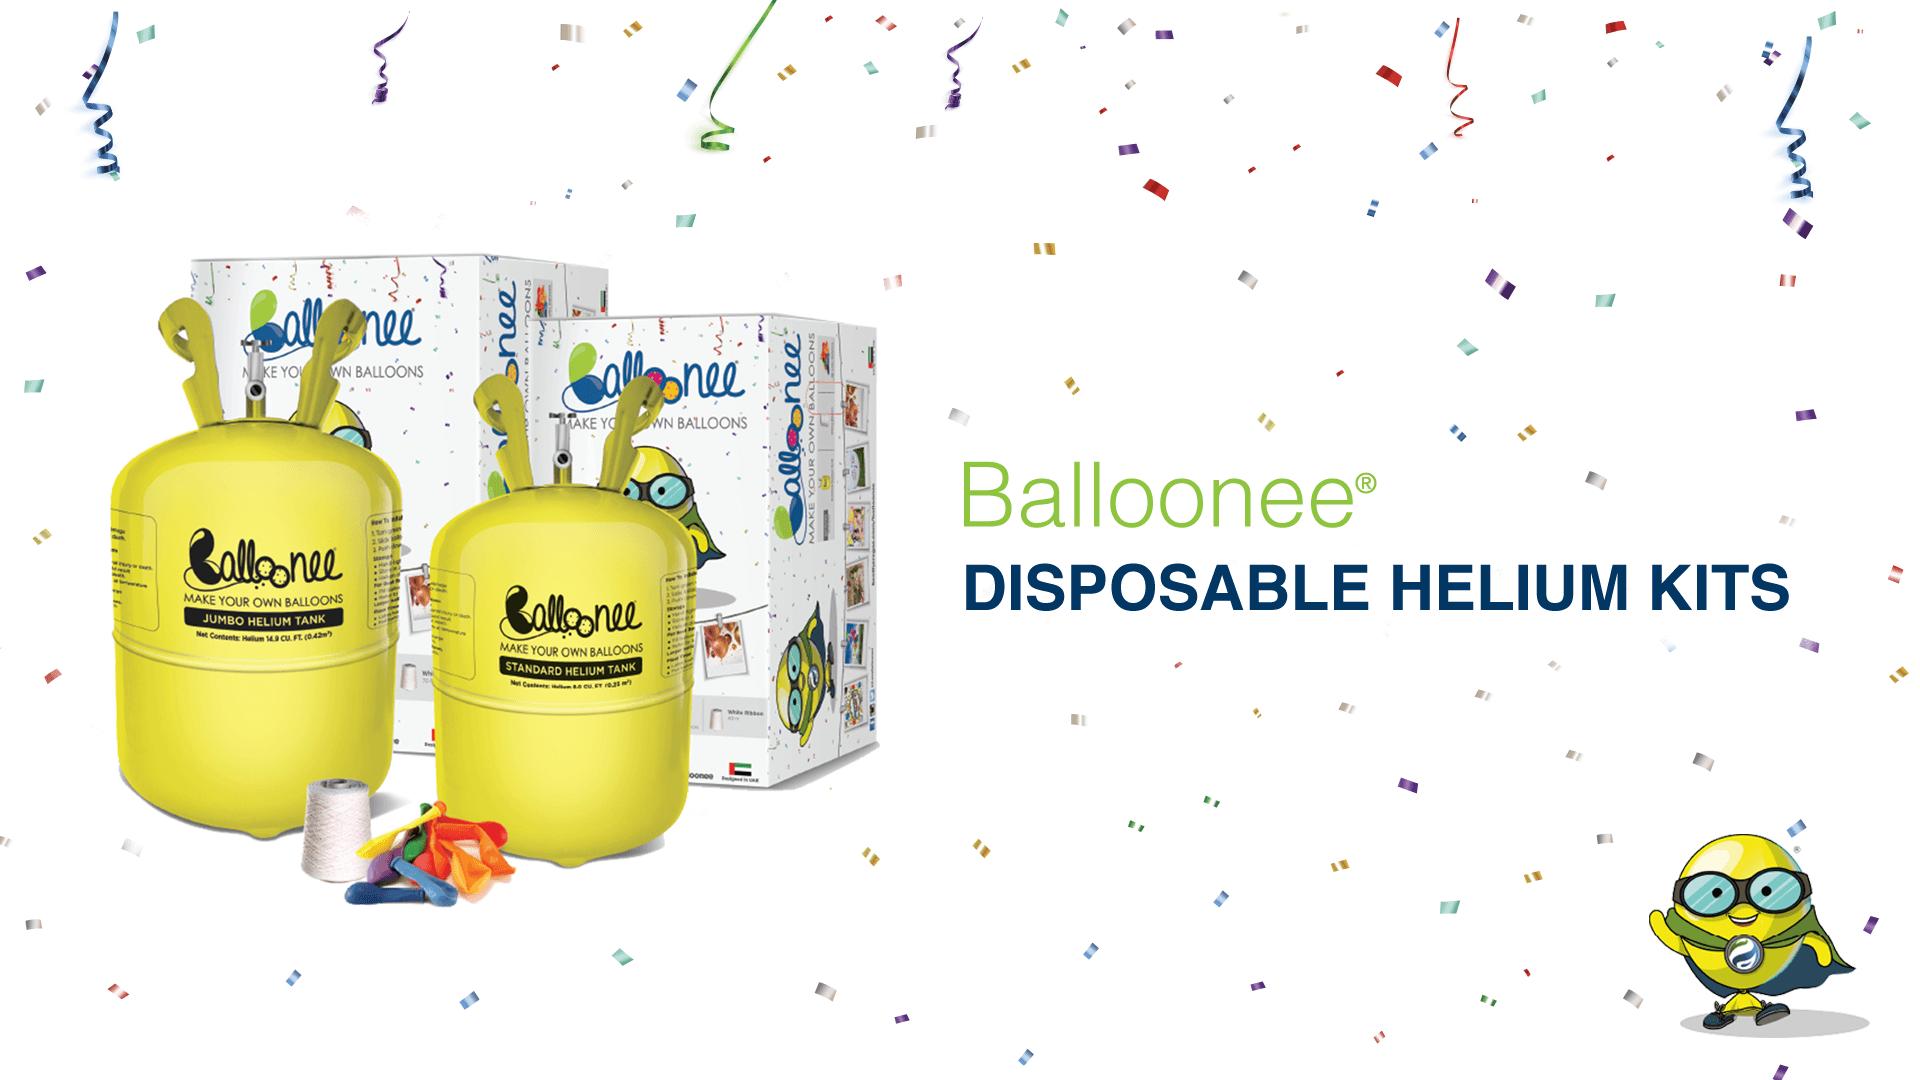 balloonee-helium-canister-helium-tanks-home-slider-2